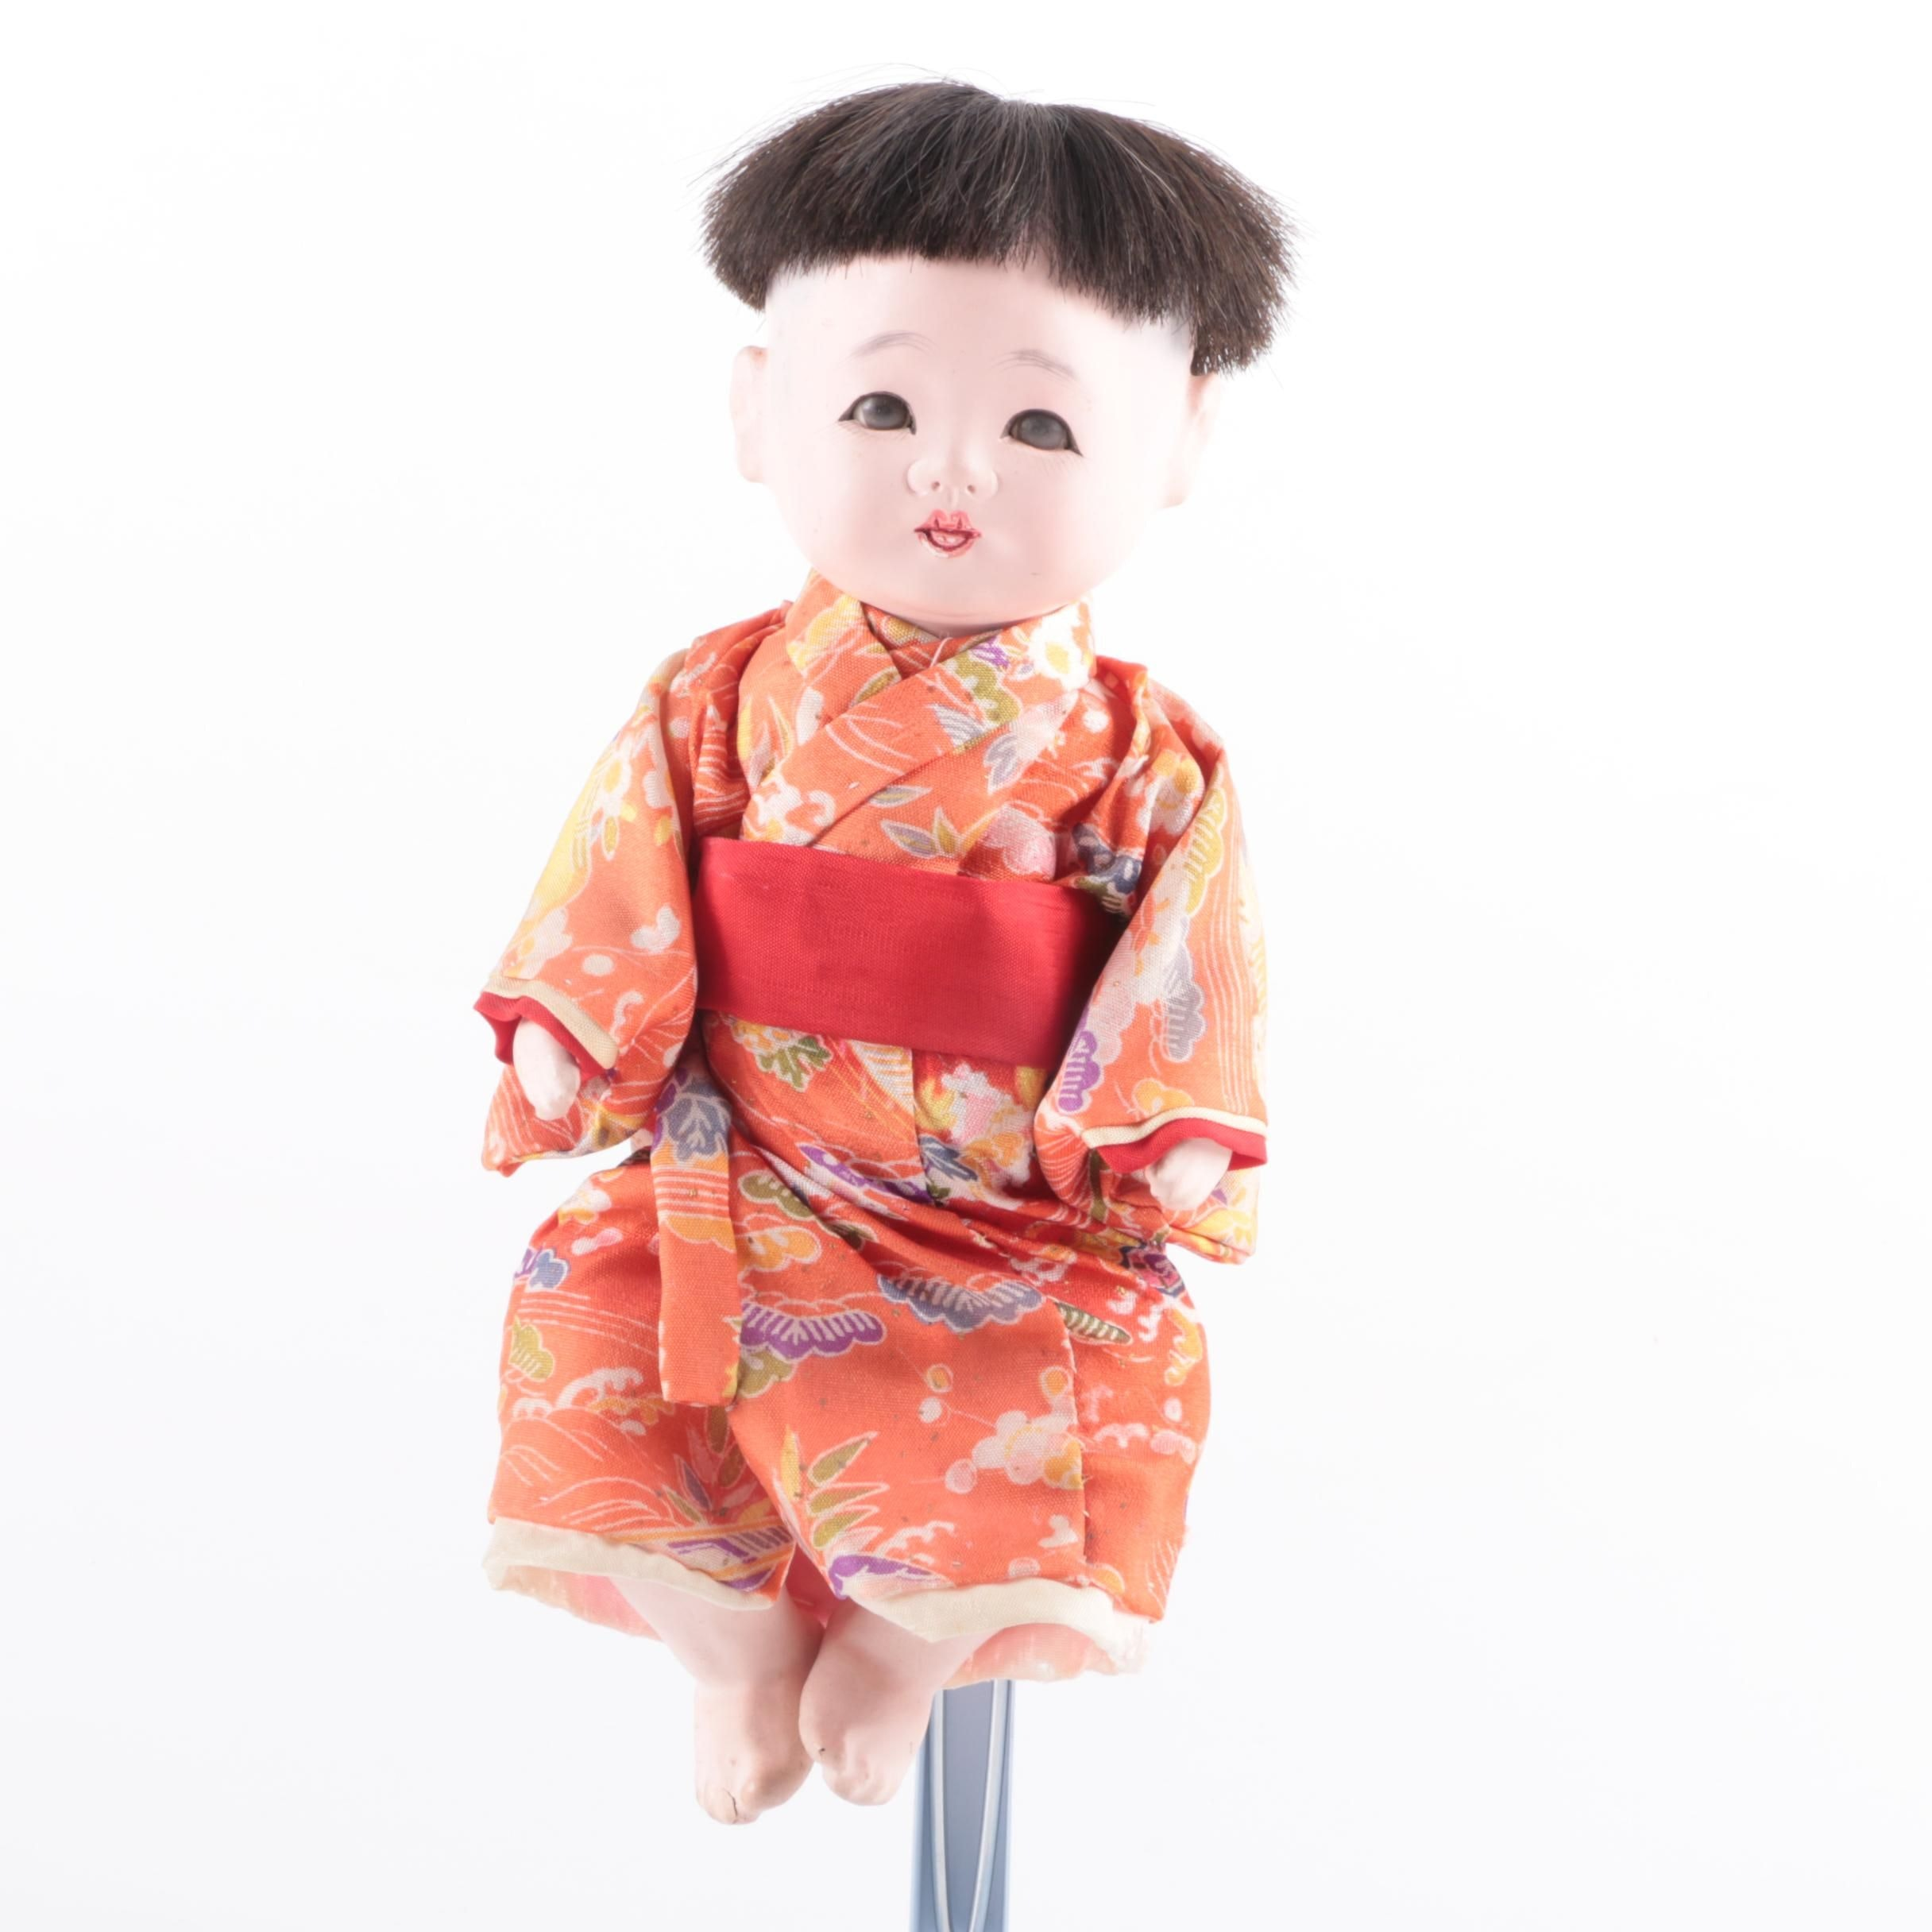 Vintage Japanese Gofun Composition Doll